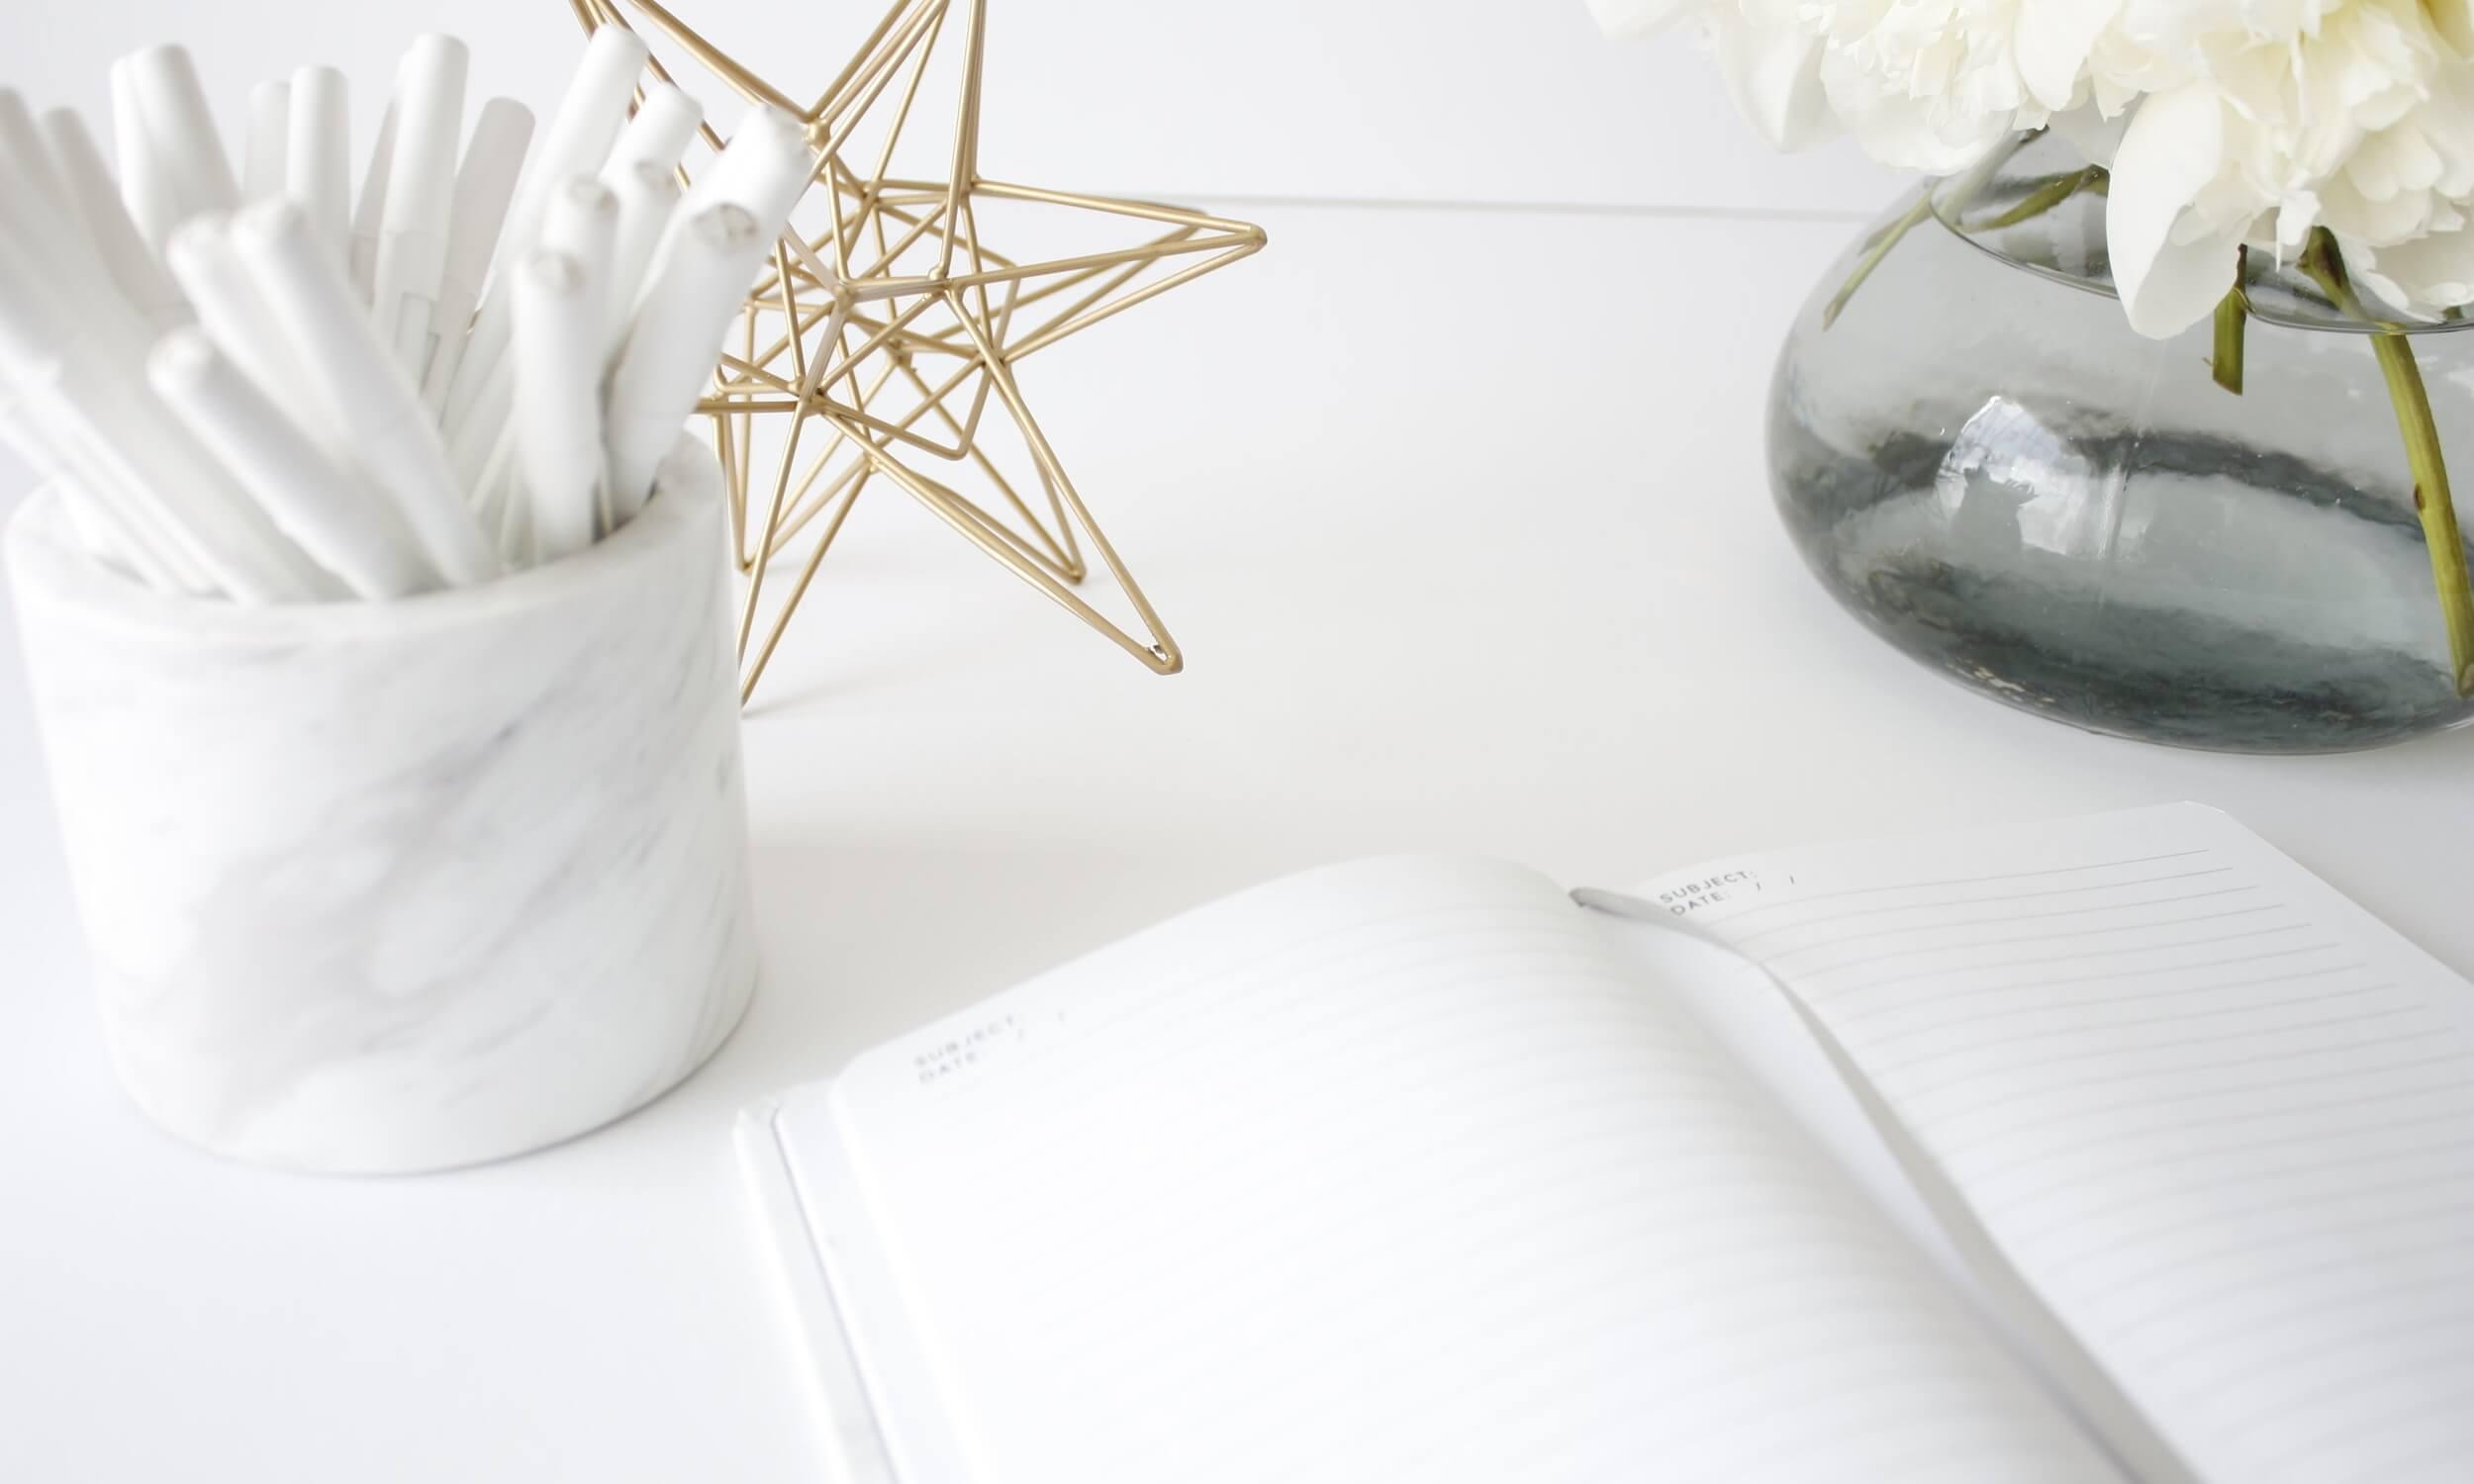 The Organizing Organization home organization and styled desk ideas